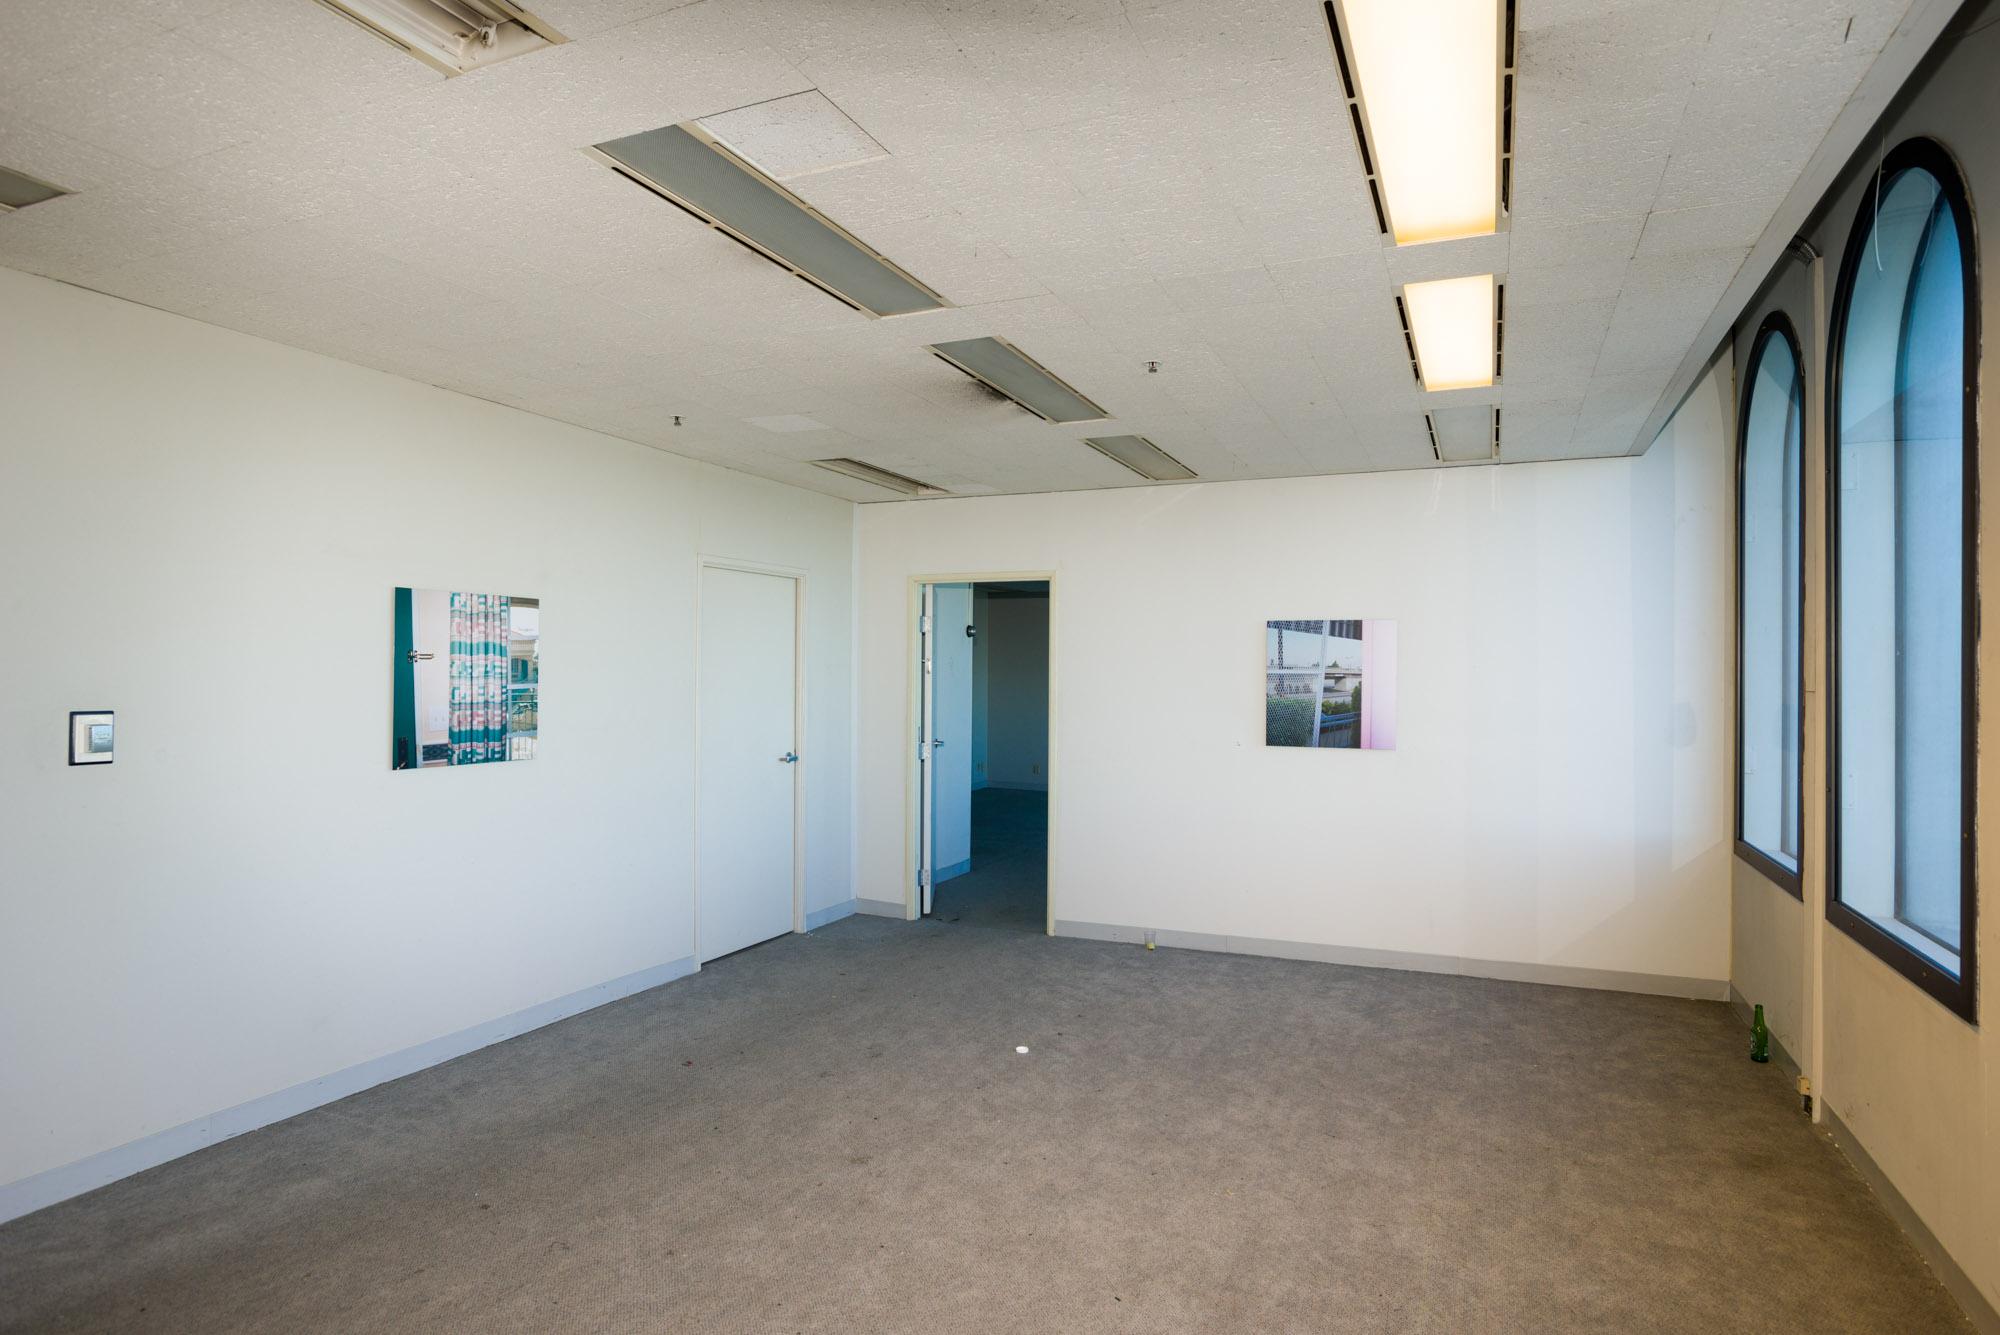 Installation view, 9800, 9800 S. Sepulveda Blvd., Los Angeles, CA, October 2015